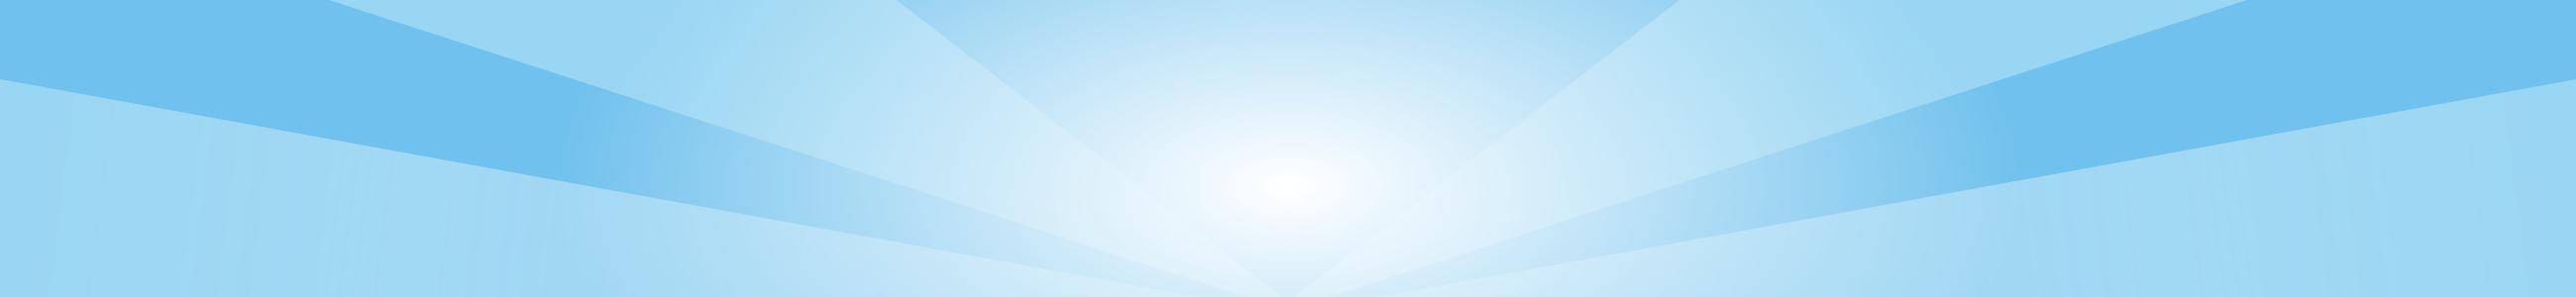 bg_header_slider_topline_2600x300